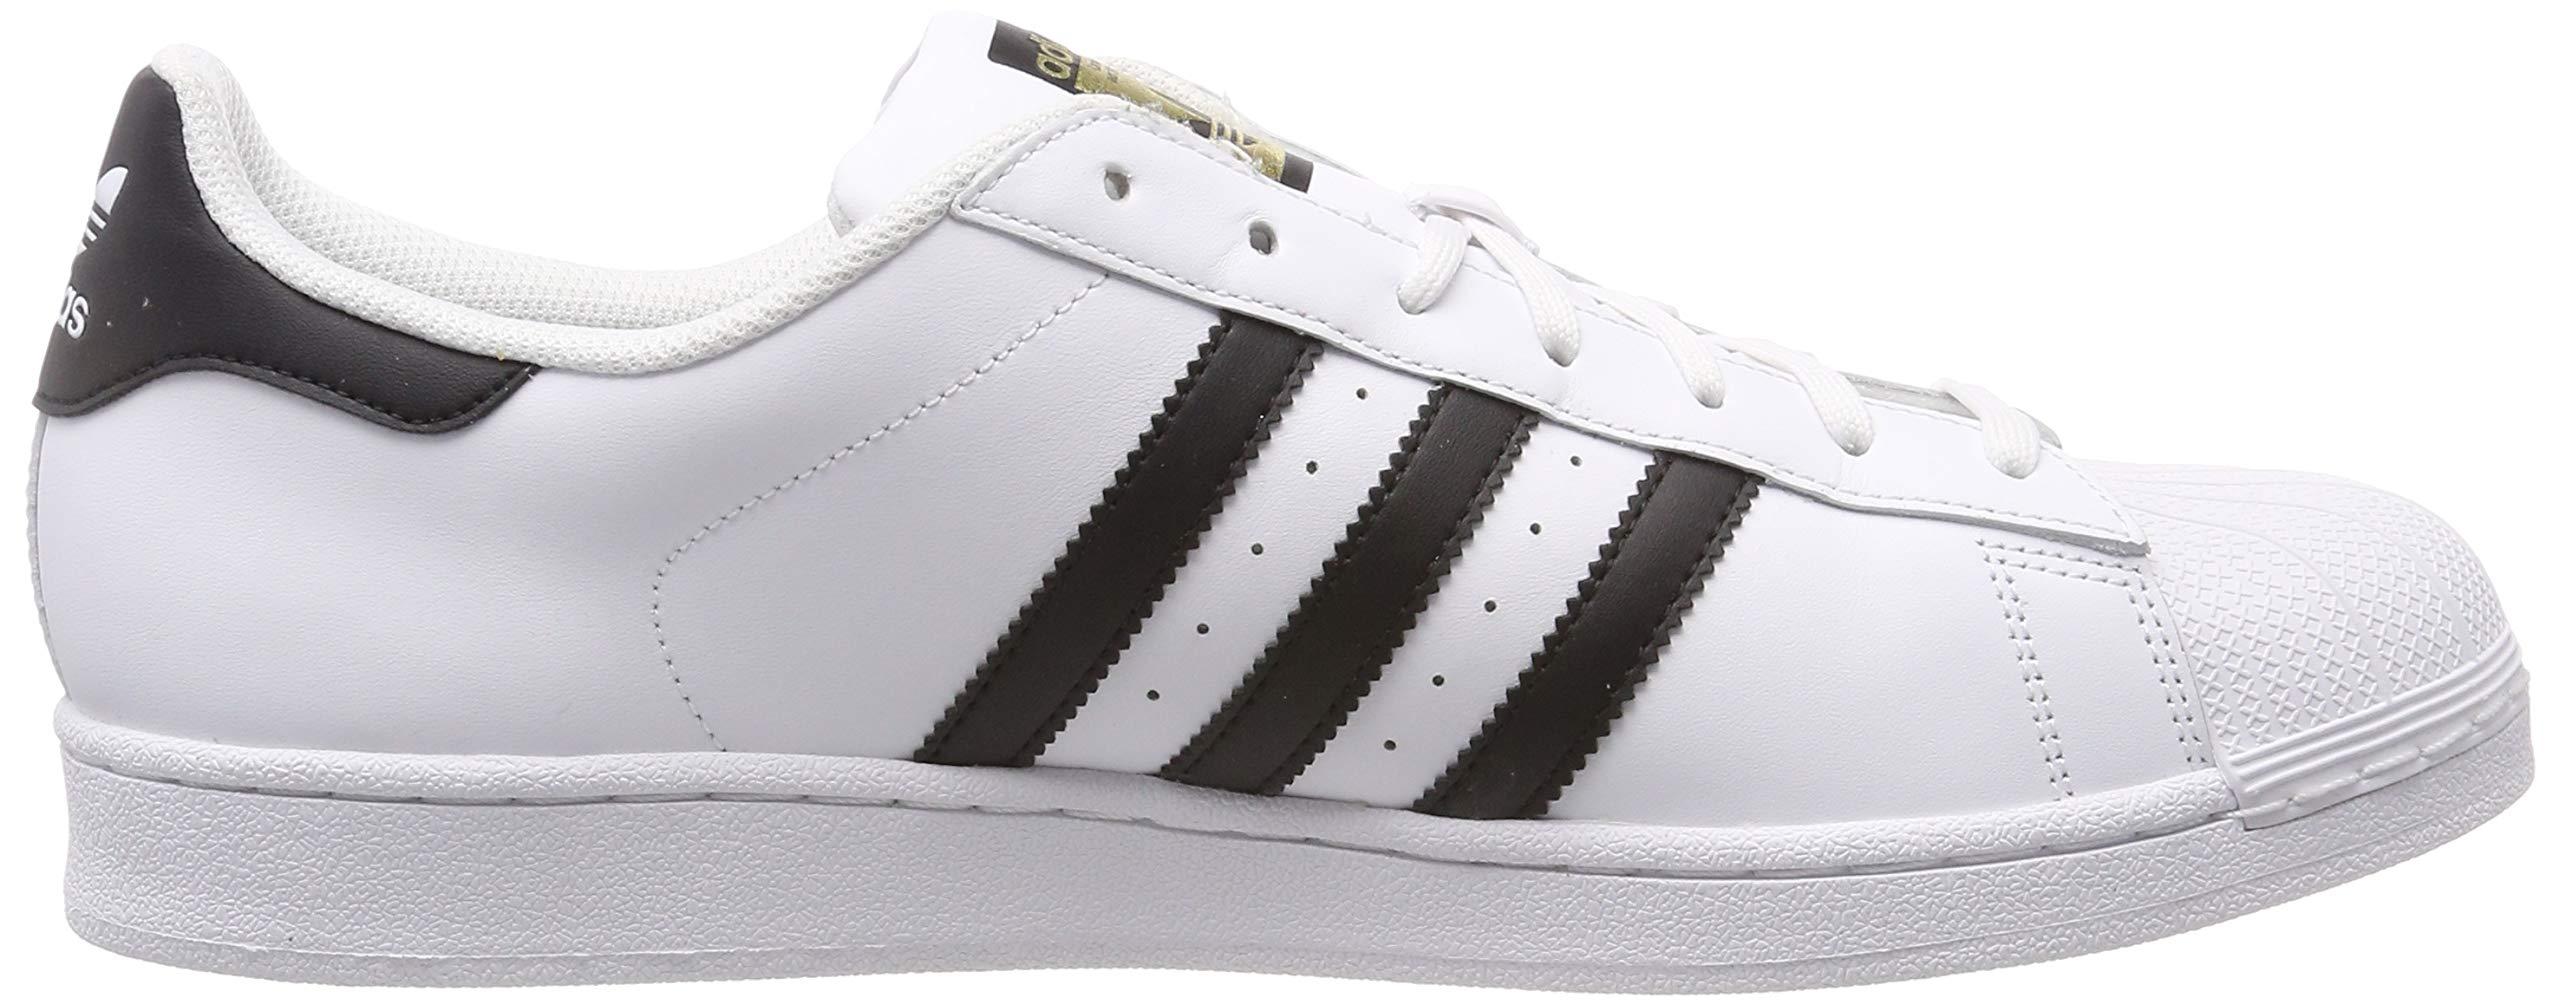 Bianco Nero Adidas C77124 Unisex Pelle Originals Scarpe 44 Superstar fxwaatzqn